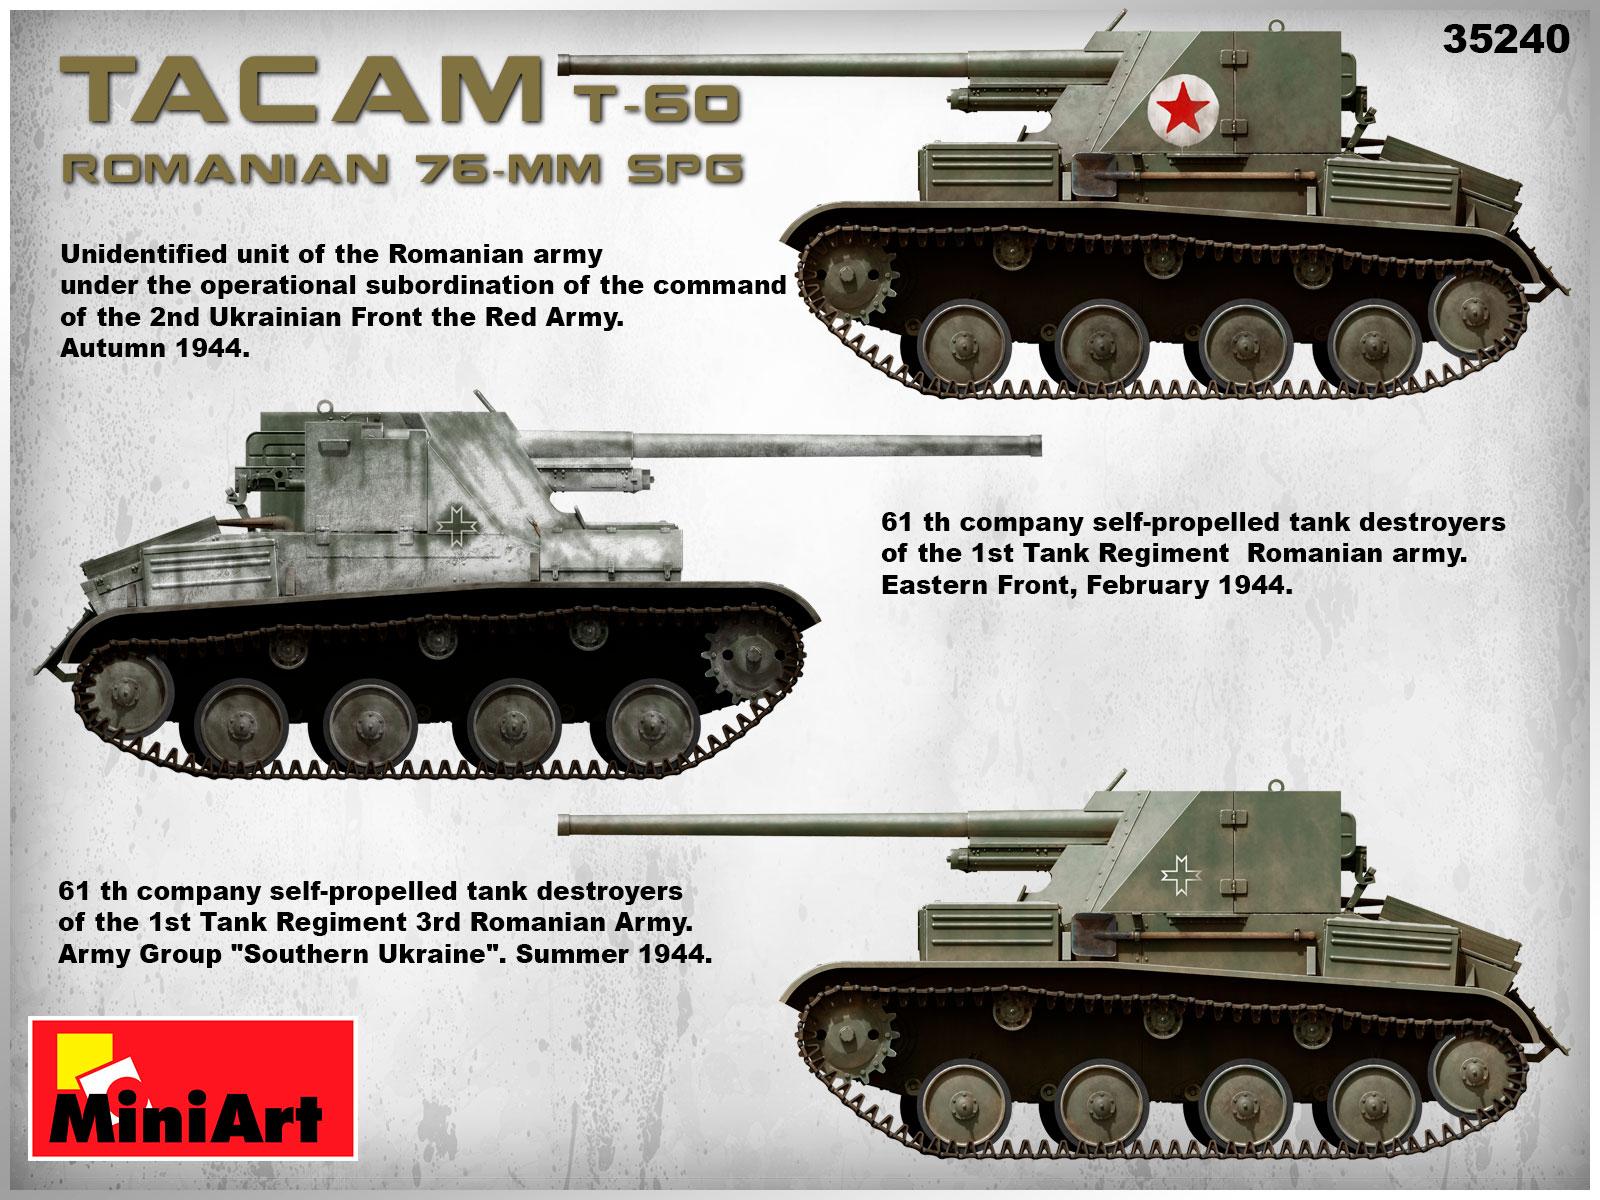 MiniArt-35240-TACAM-T-60-13 Rumänischer 7,62mm Panzerjäger TACAM auf Fahrgestell T-60 von MiniArt 35240